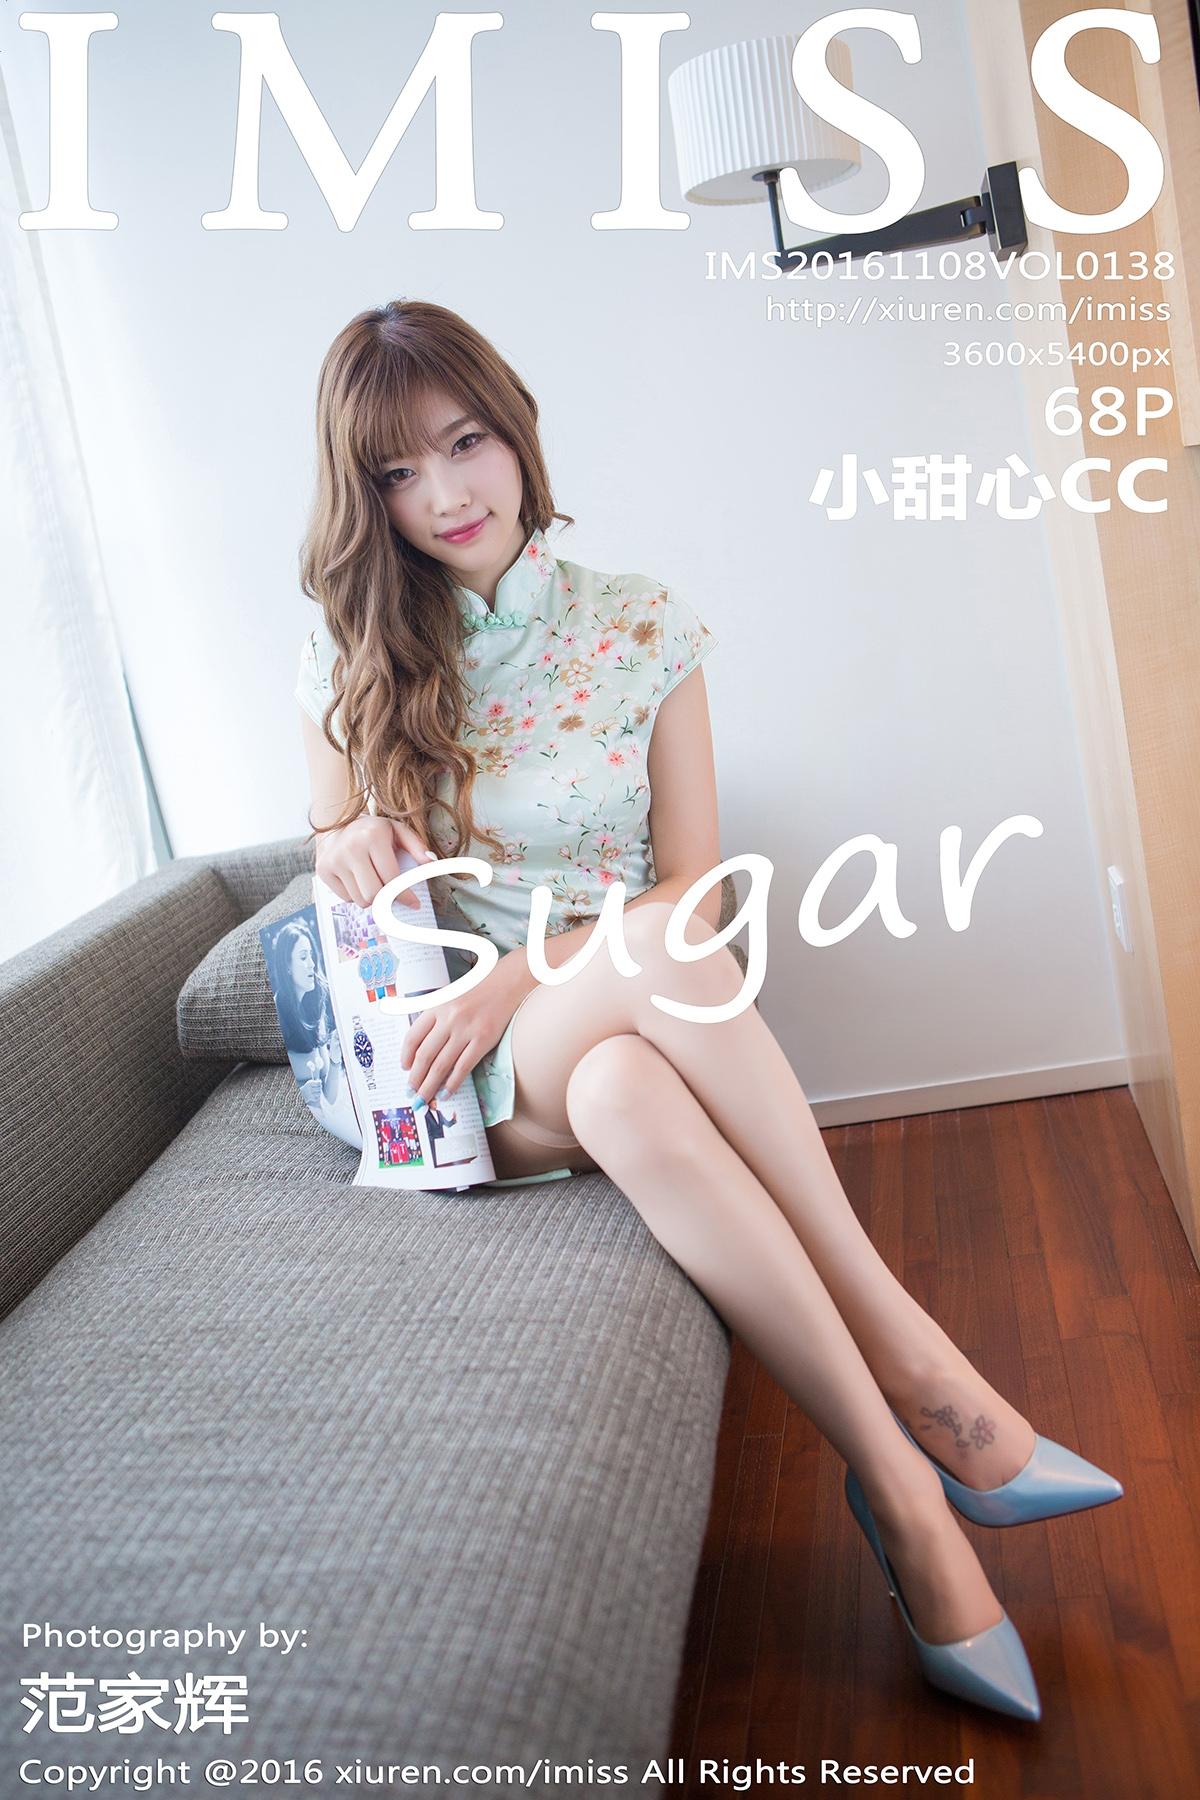 [IMISS爱蜜社]2016.11.08 VOL.138 杨晨晨sugar小甜心CC[/315MB]